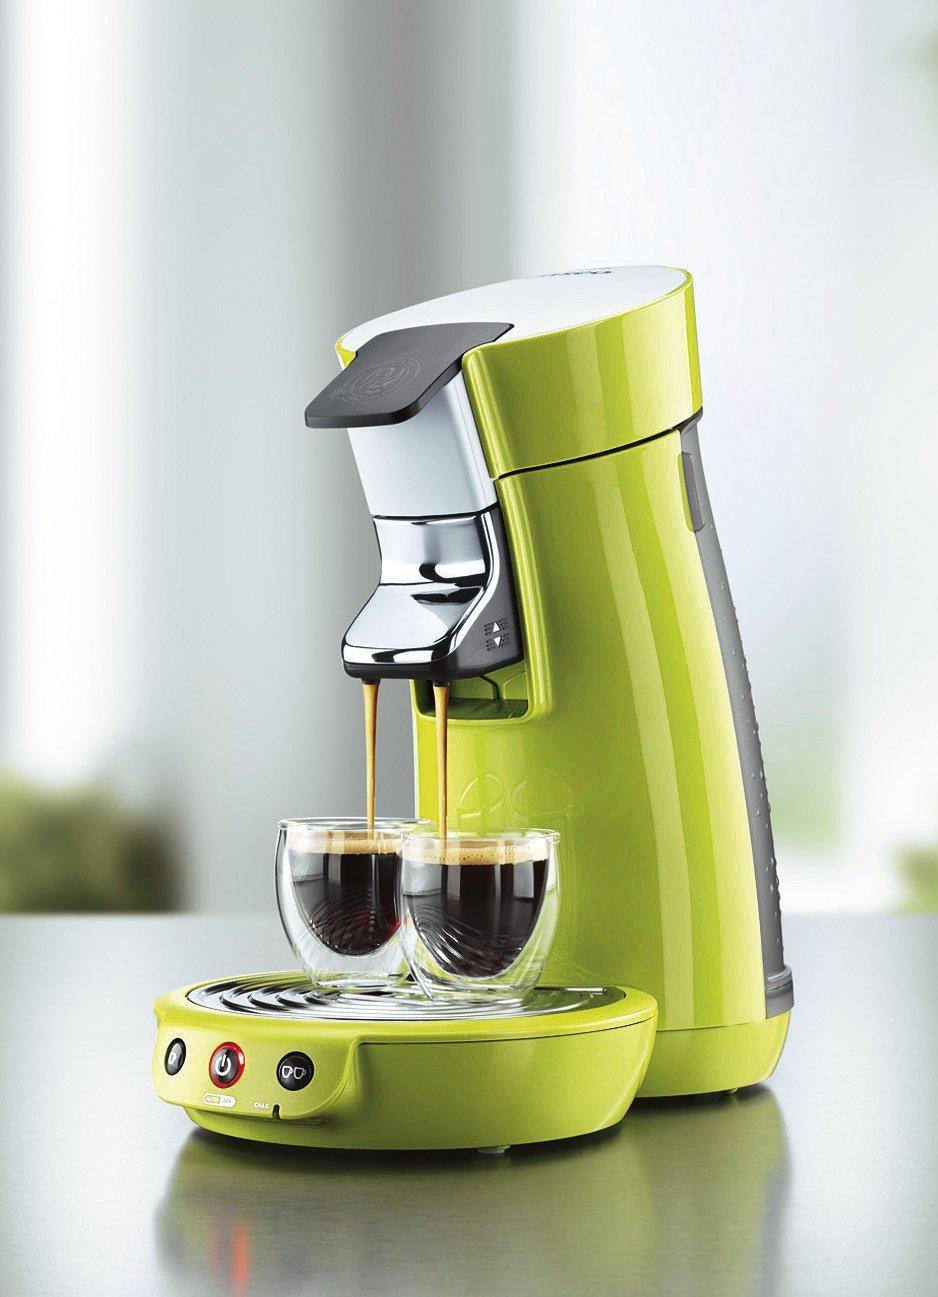 philips senseo viva cafe hd7825 gr n kaffeepadmaschine kaffeemaschine kaffee ebay. Black Bedroom Furniture Sets. Home Design Ideas